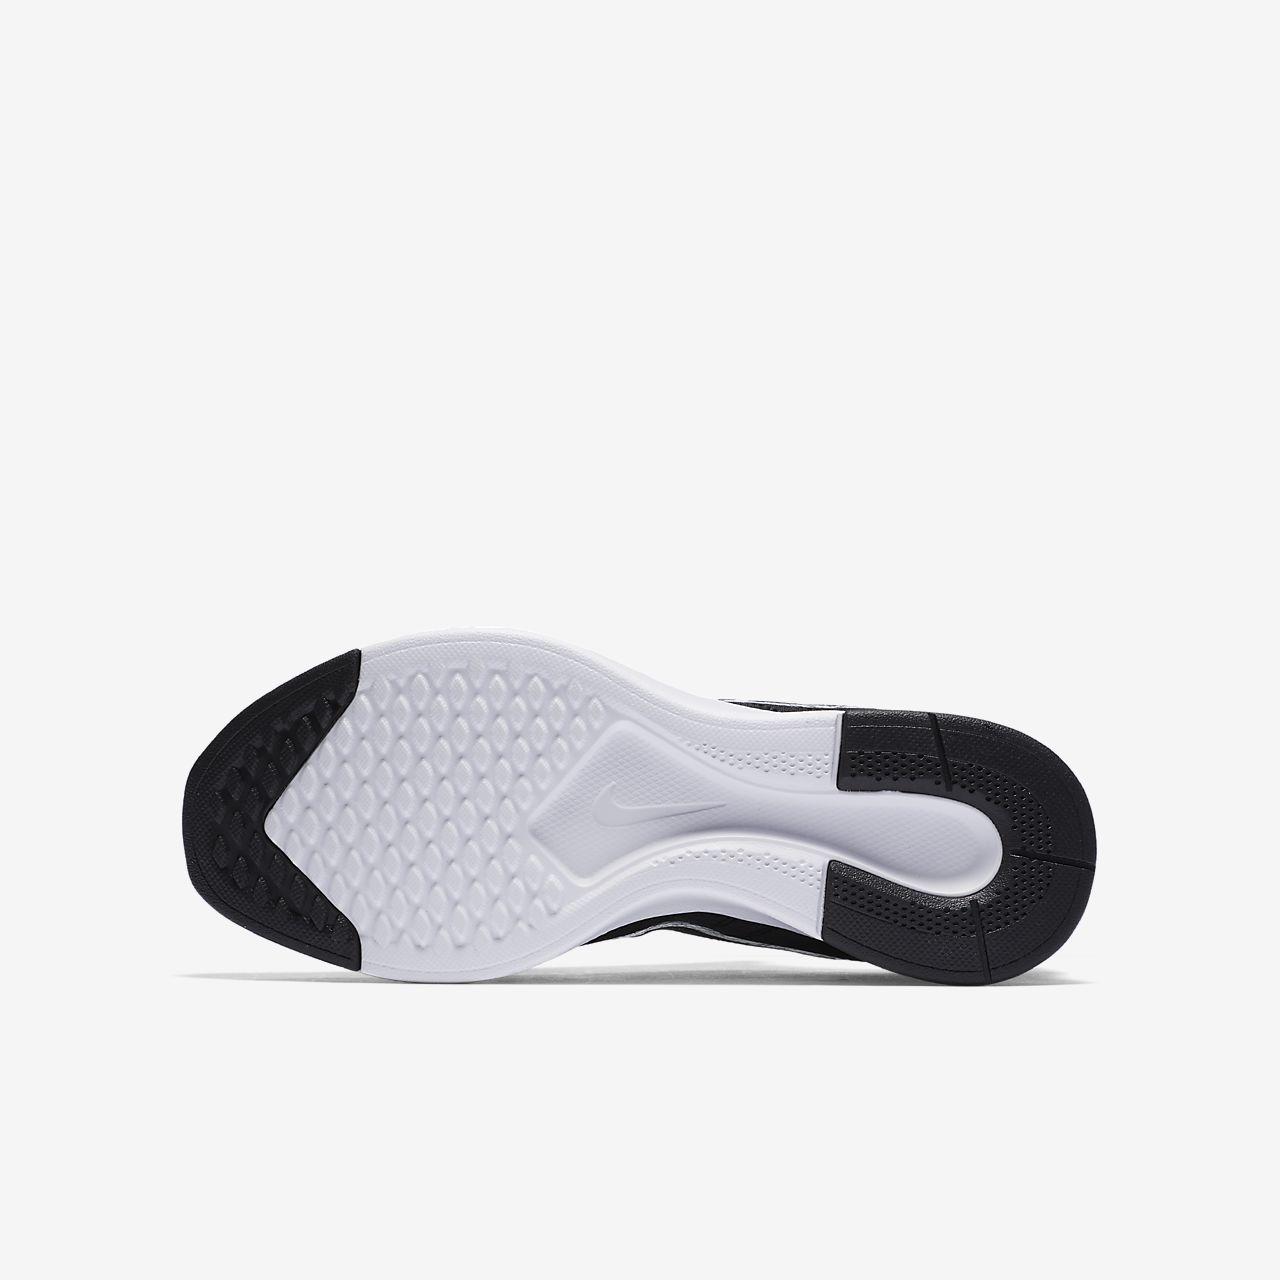 c2db62f1ad67 Nike Dualtone Racer Older Kids  Shoe. Nike.com RO